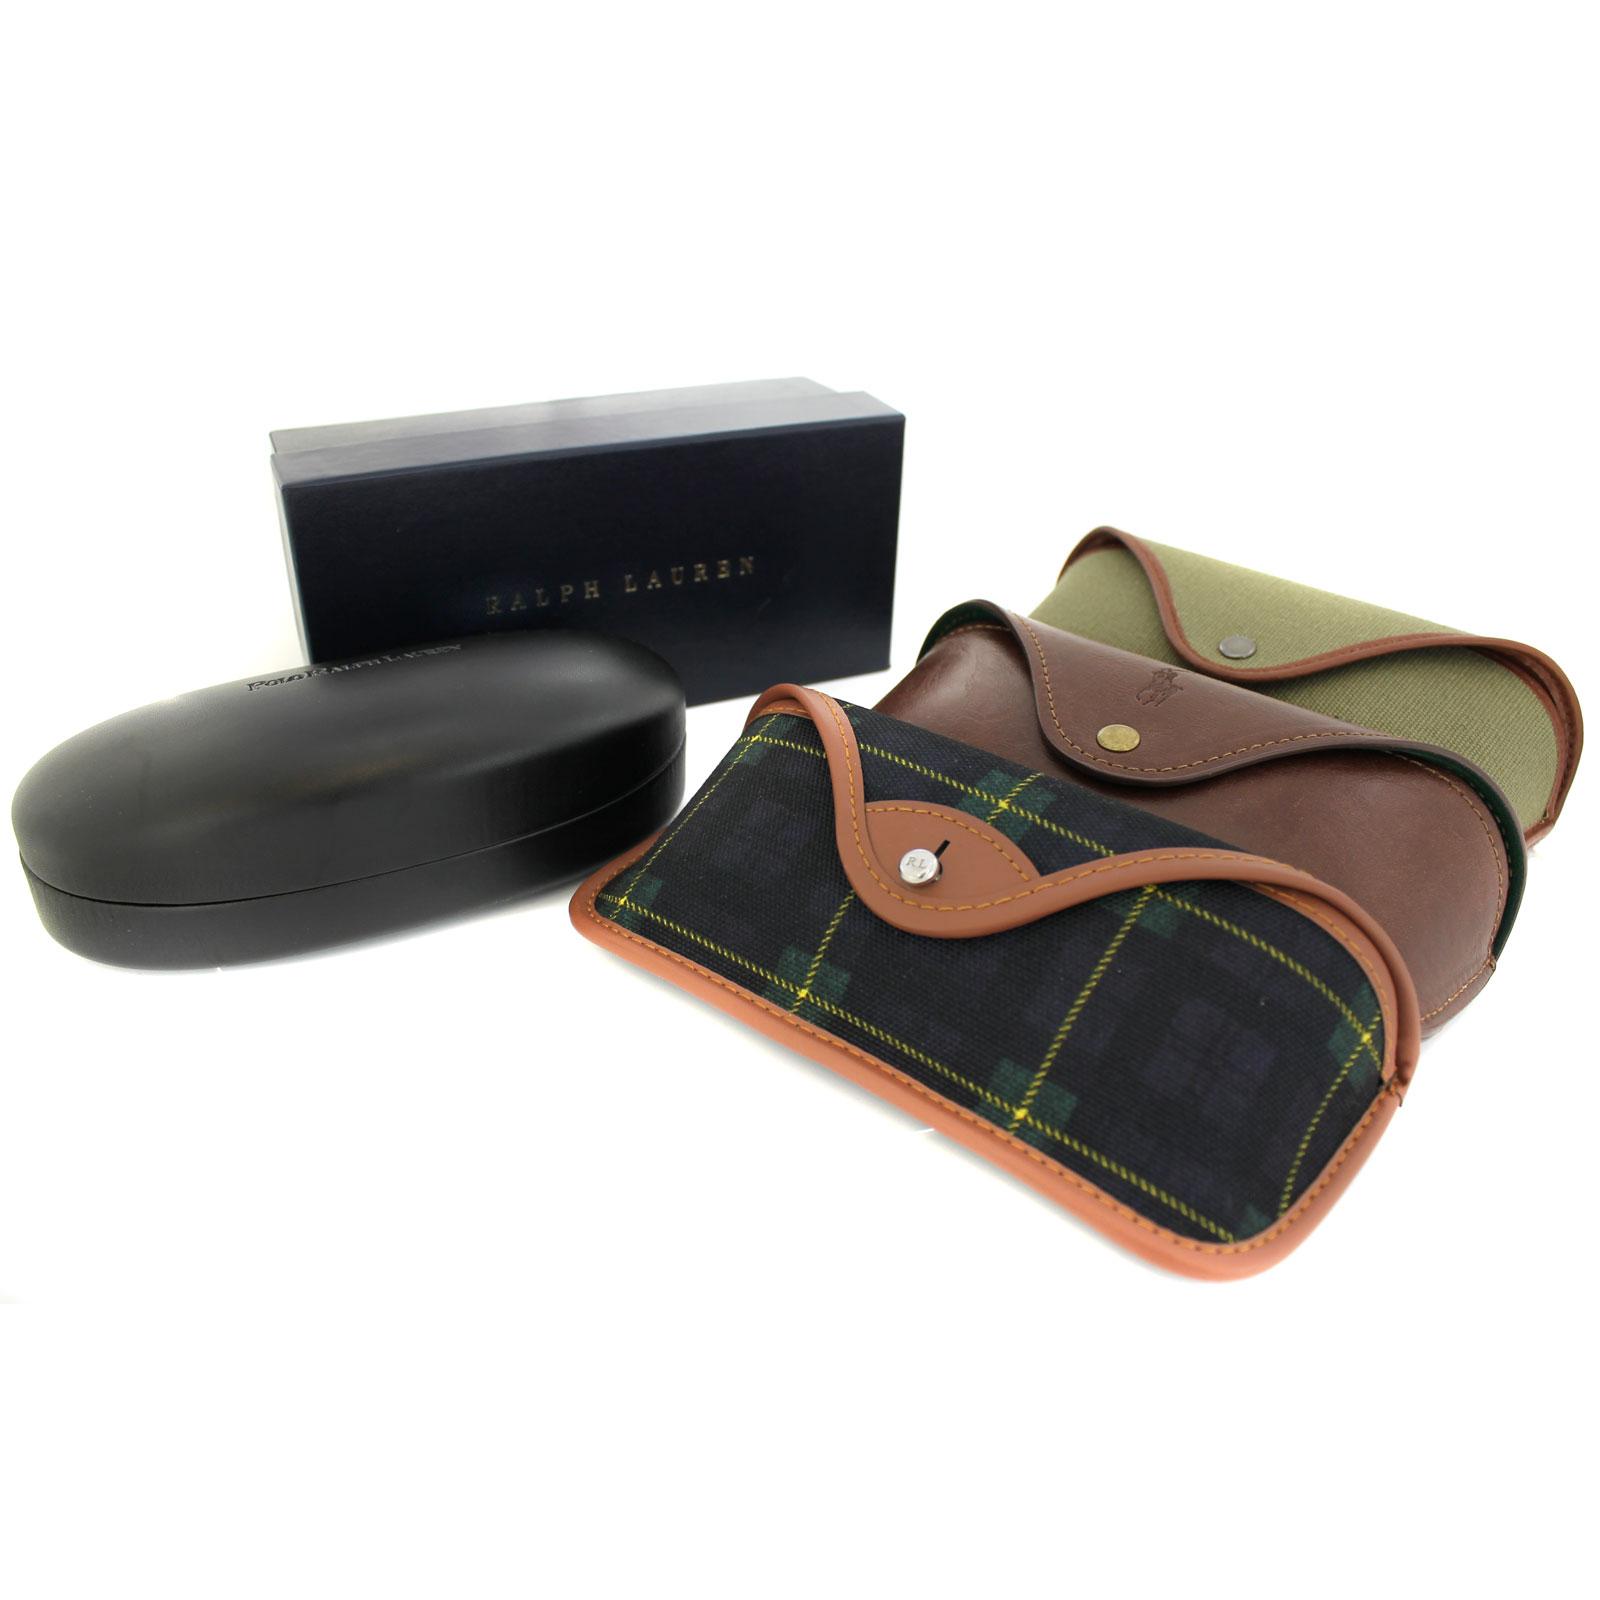 Ralph Lauren Sunglasses  polo ralph lauren sunglasses 4110 528487 matt black grey ebay